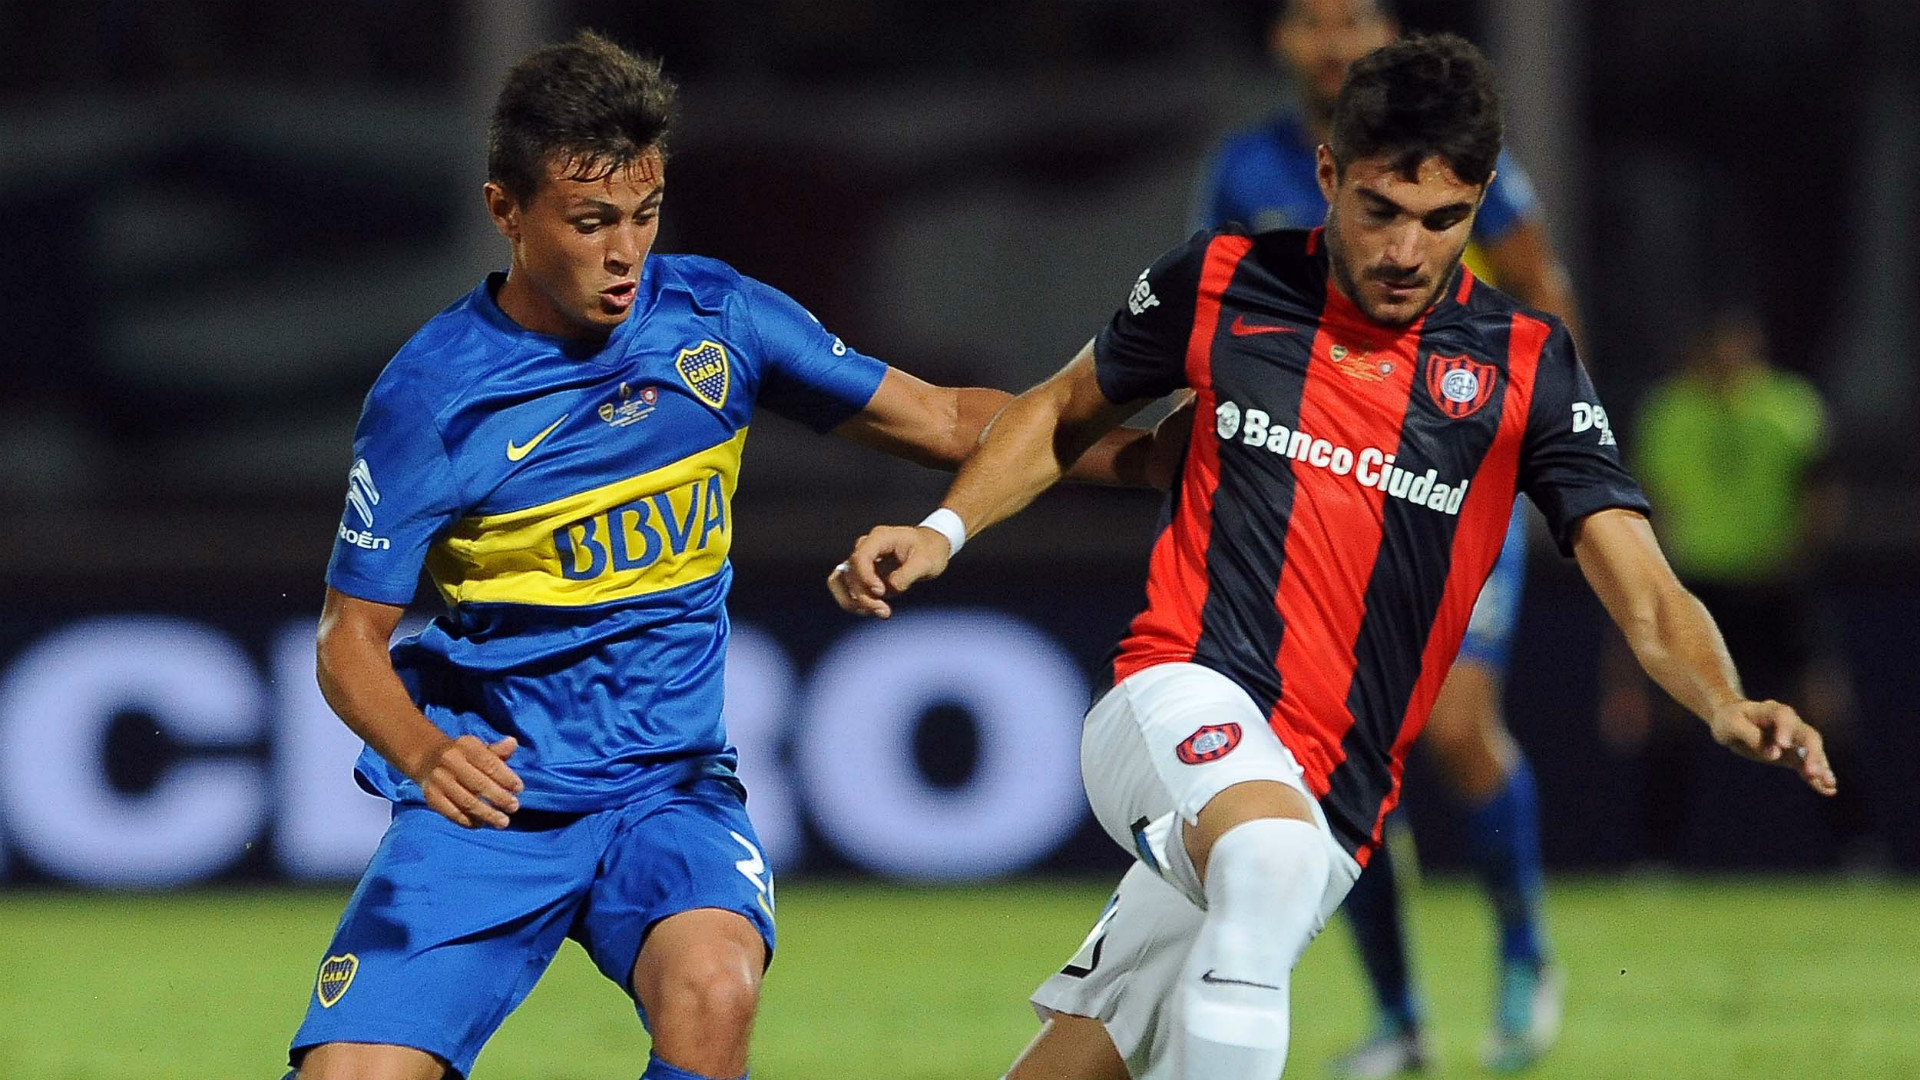 Adrián Cubas Ezequiel Cerutti Boca San Lorenzo Supercopa Argentina